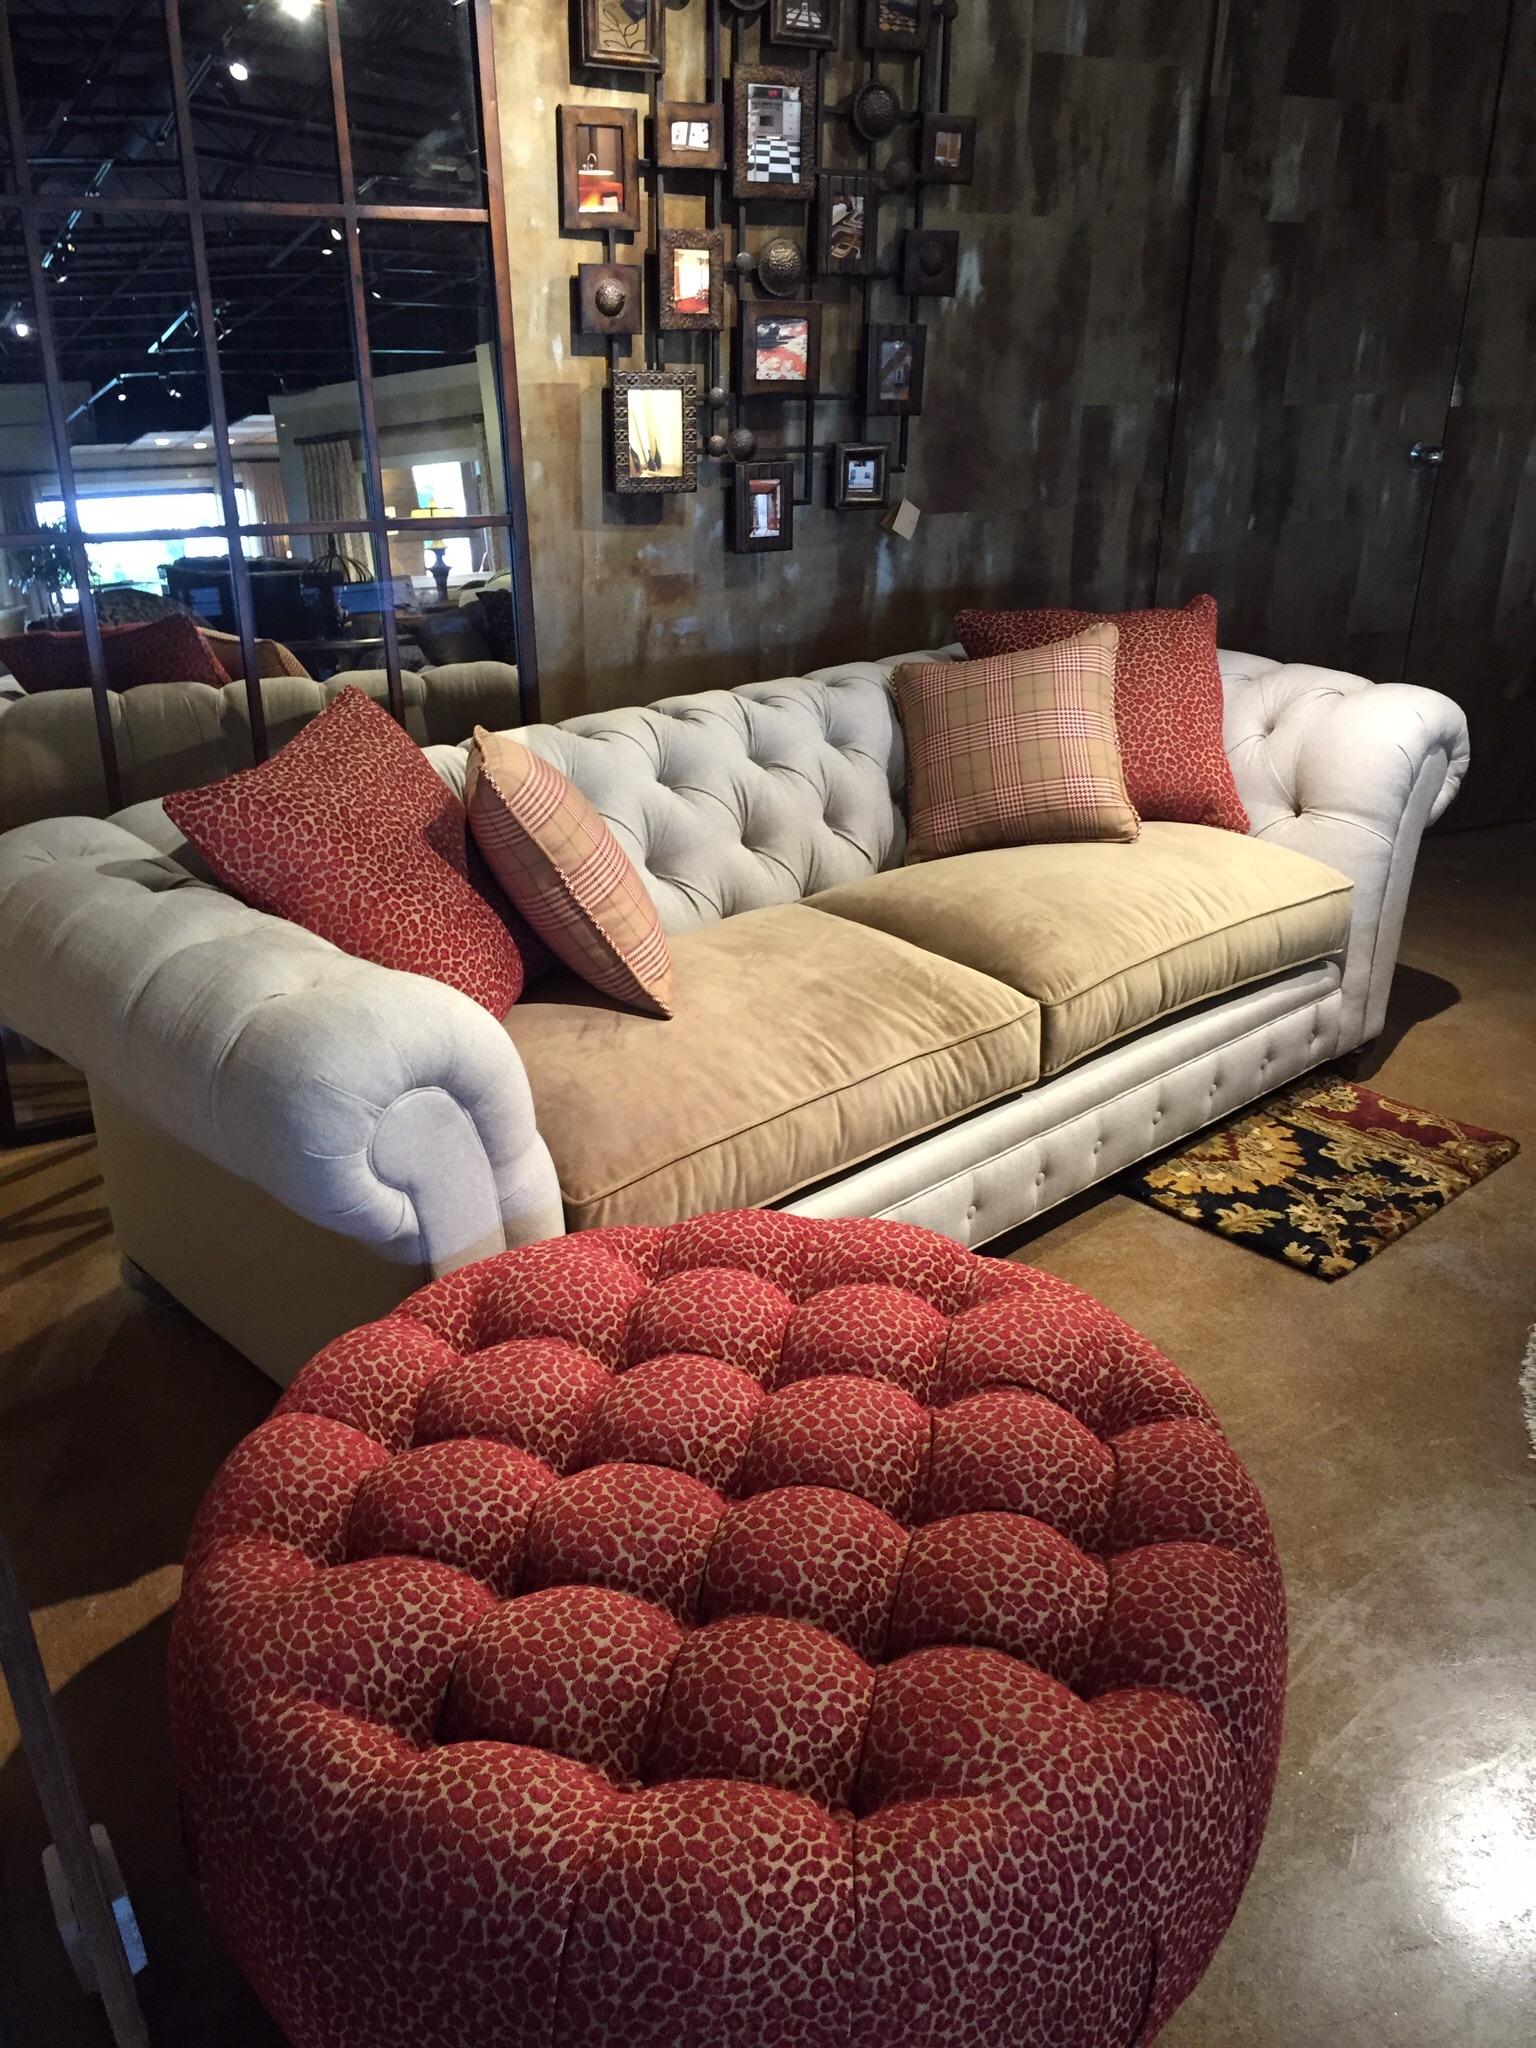 Esquire interiors in plymouth mi 734 451 1 for A p furniture trail